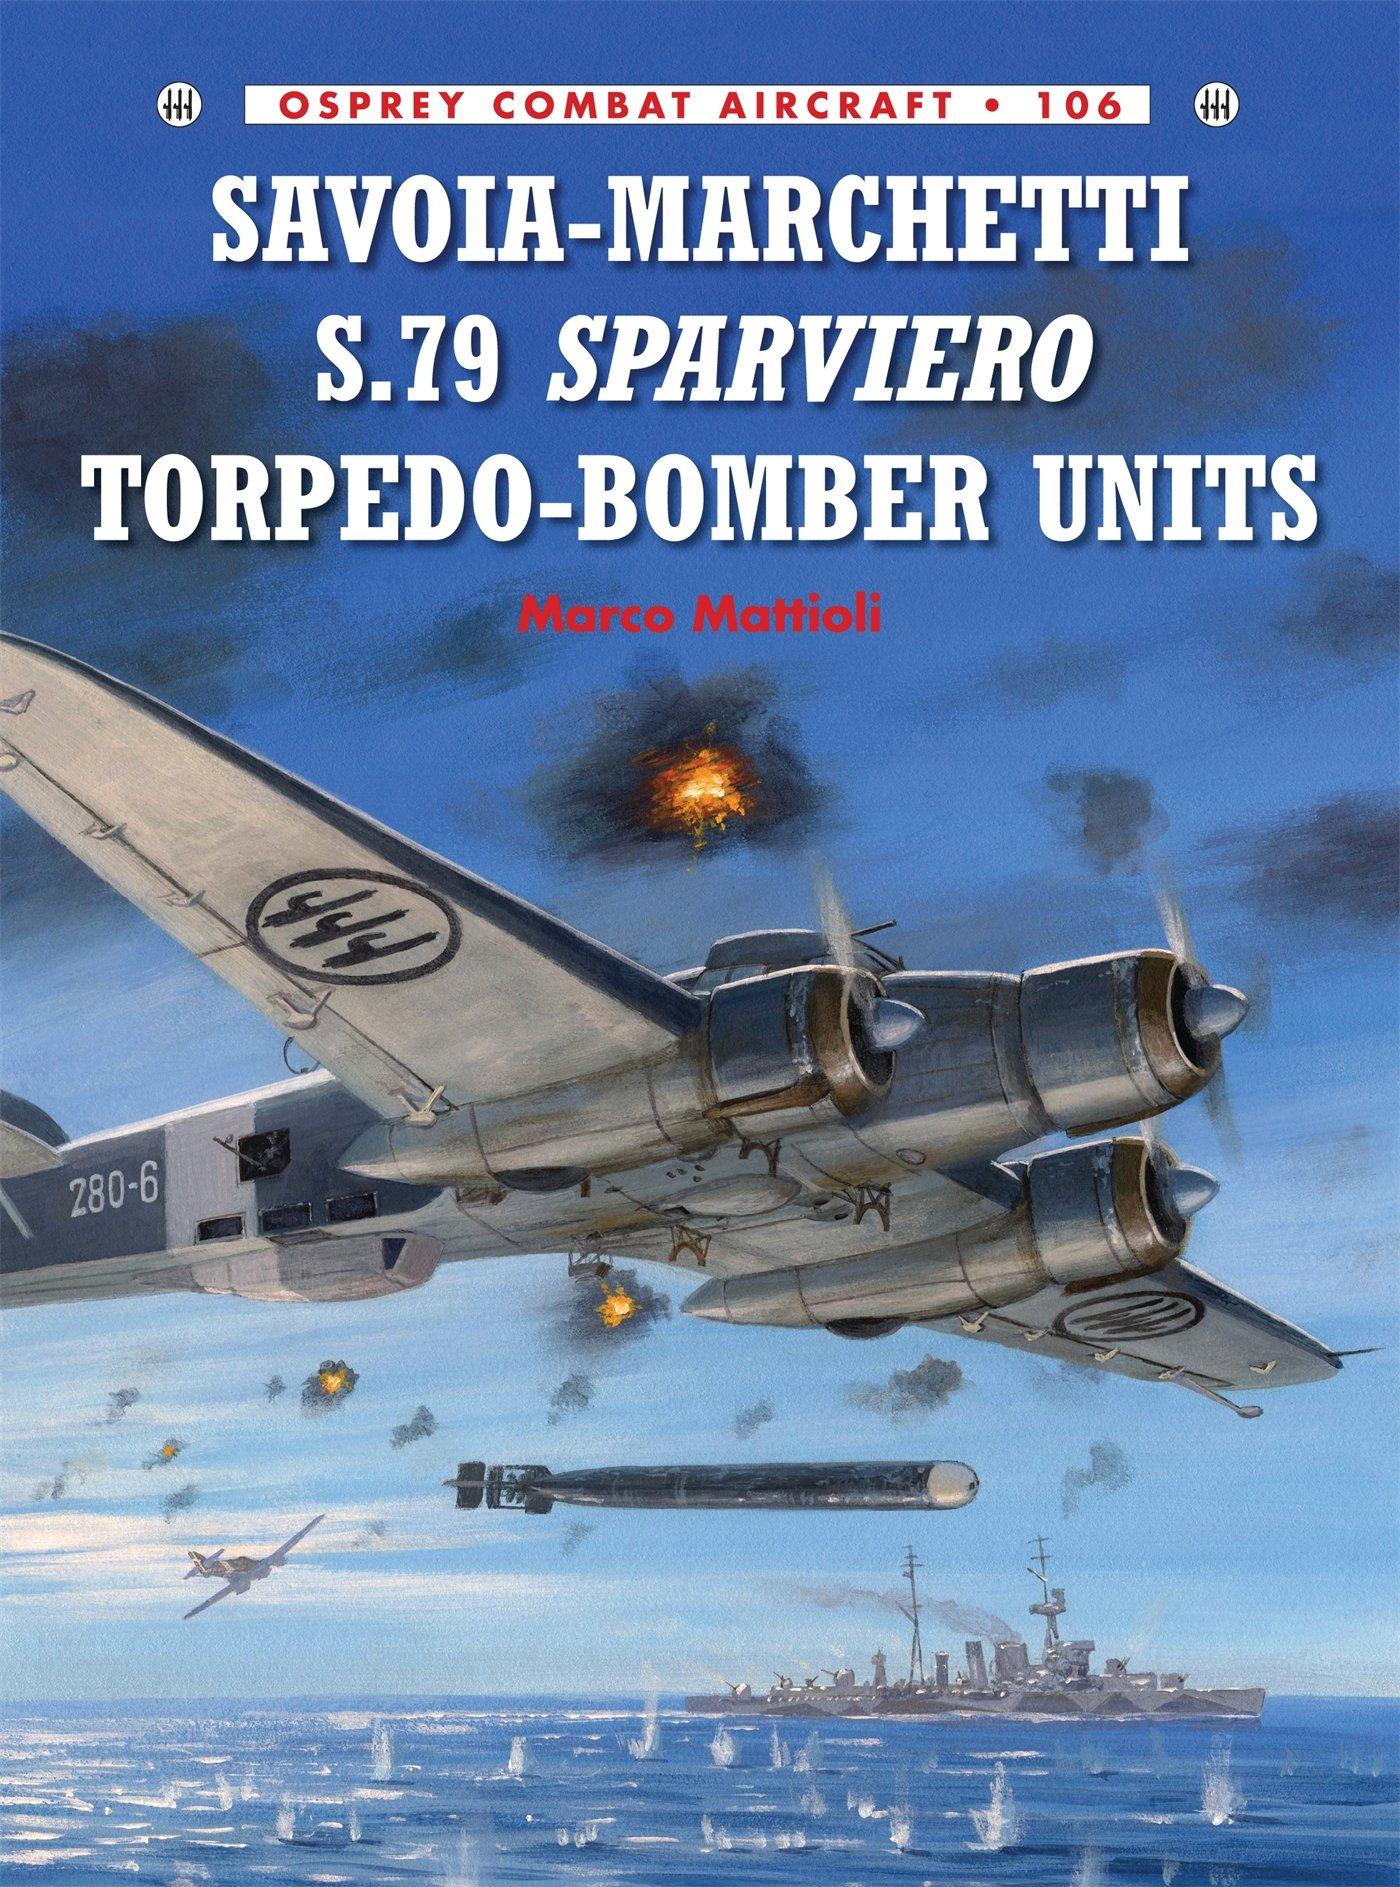 Savoia marchetti sm 79 gobba page 4 - Savoia Marchetti S 79 Sparviero Torpedo Bomber Units Combat Aircraft Marco Mattioli Richard Caruana Mark Postlethwaite 9781782008071 Amazon Com